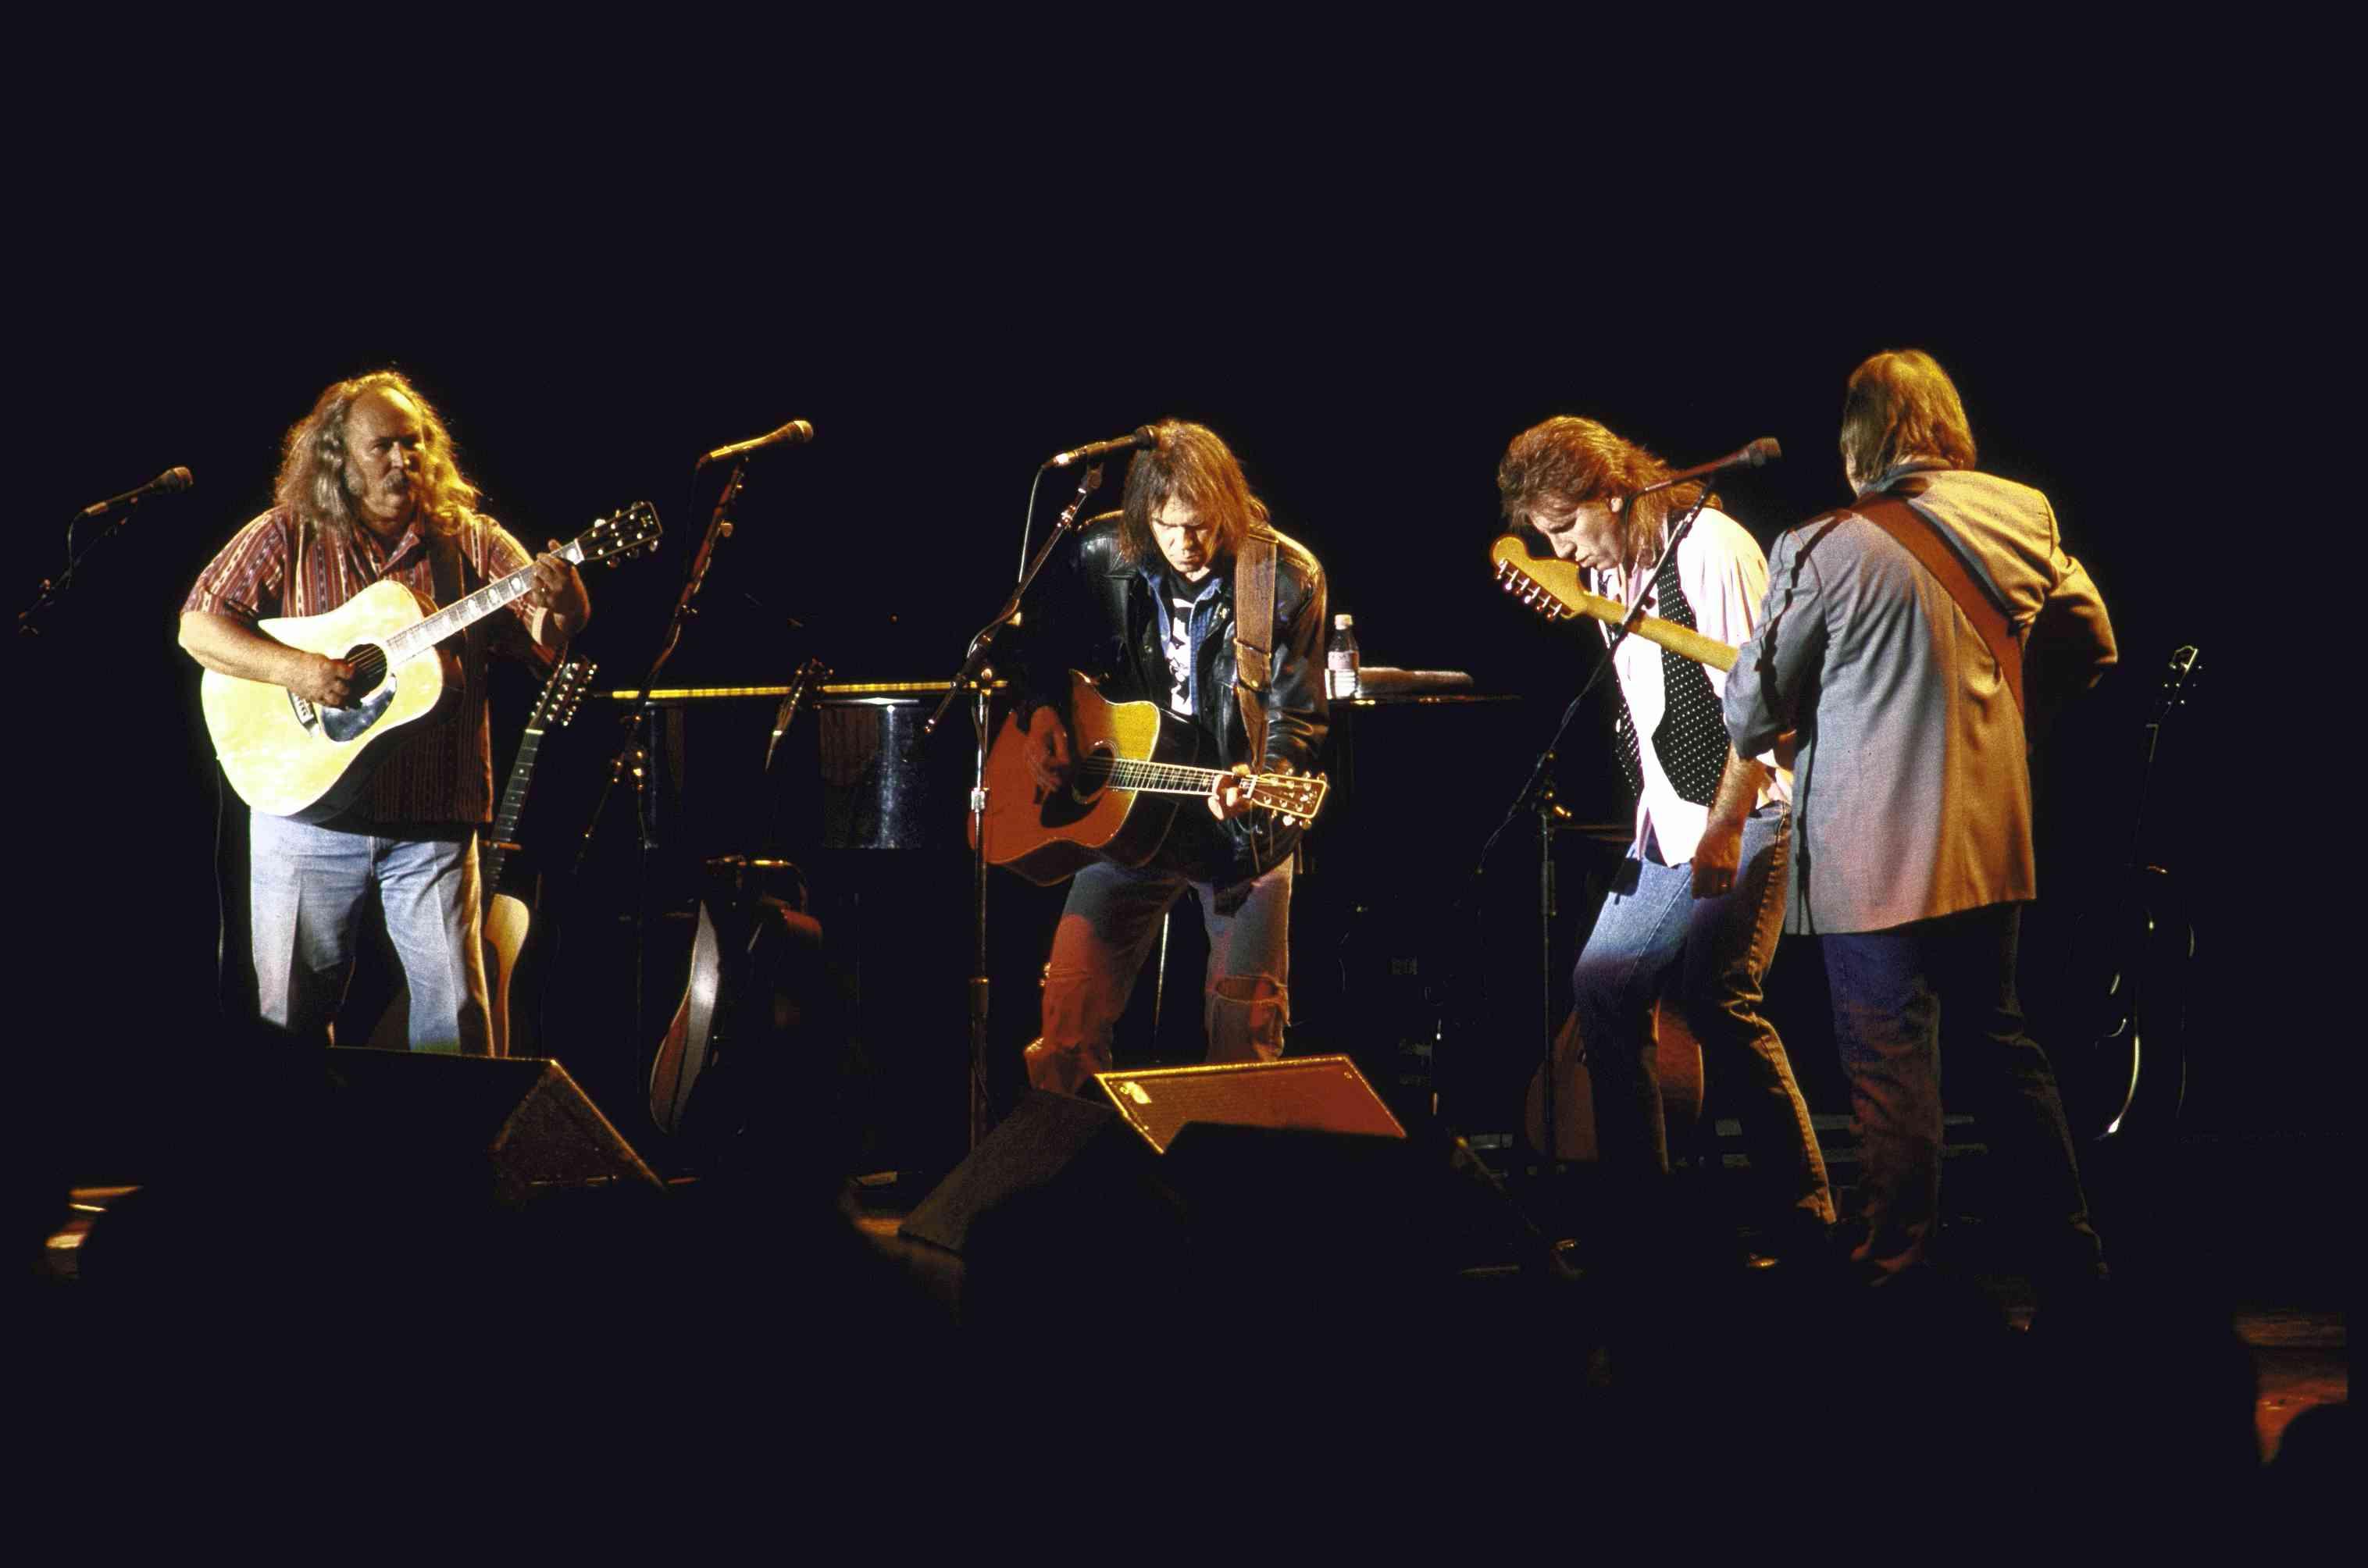 Crosby, Stills, Nash & Young performing live